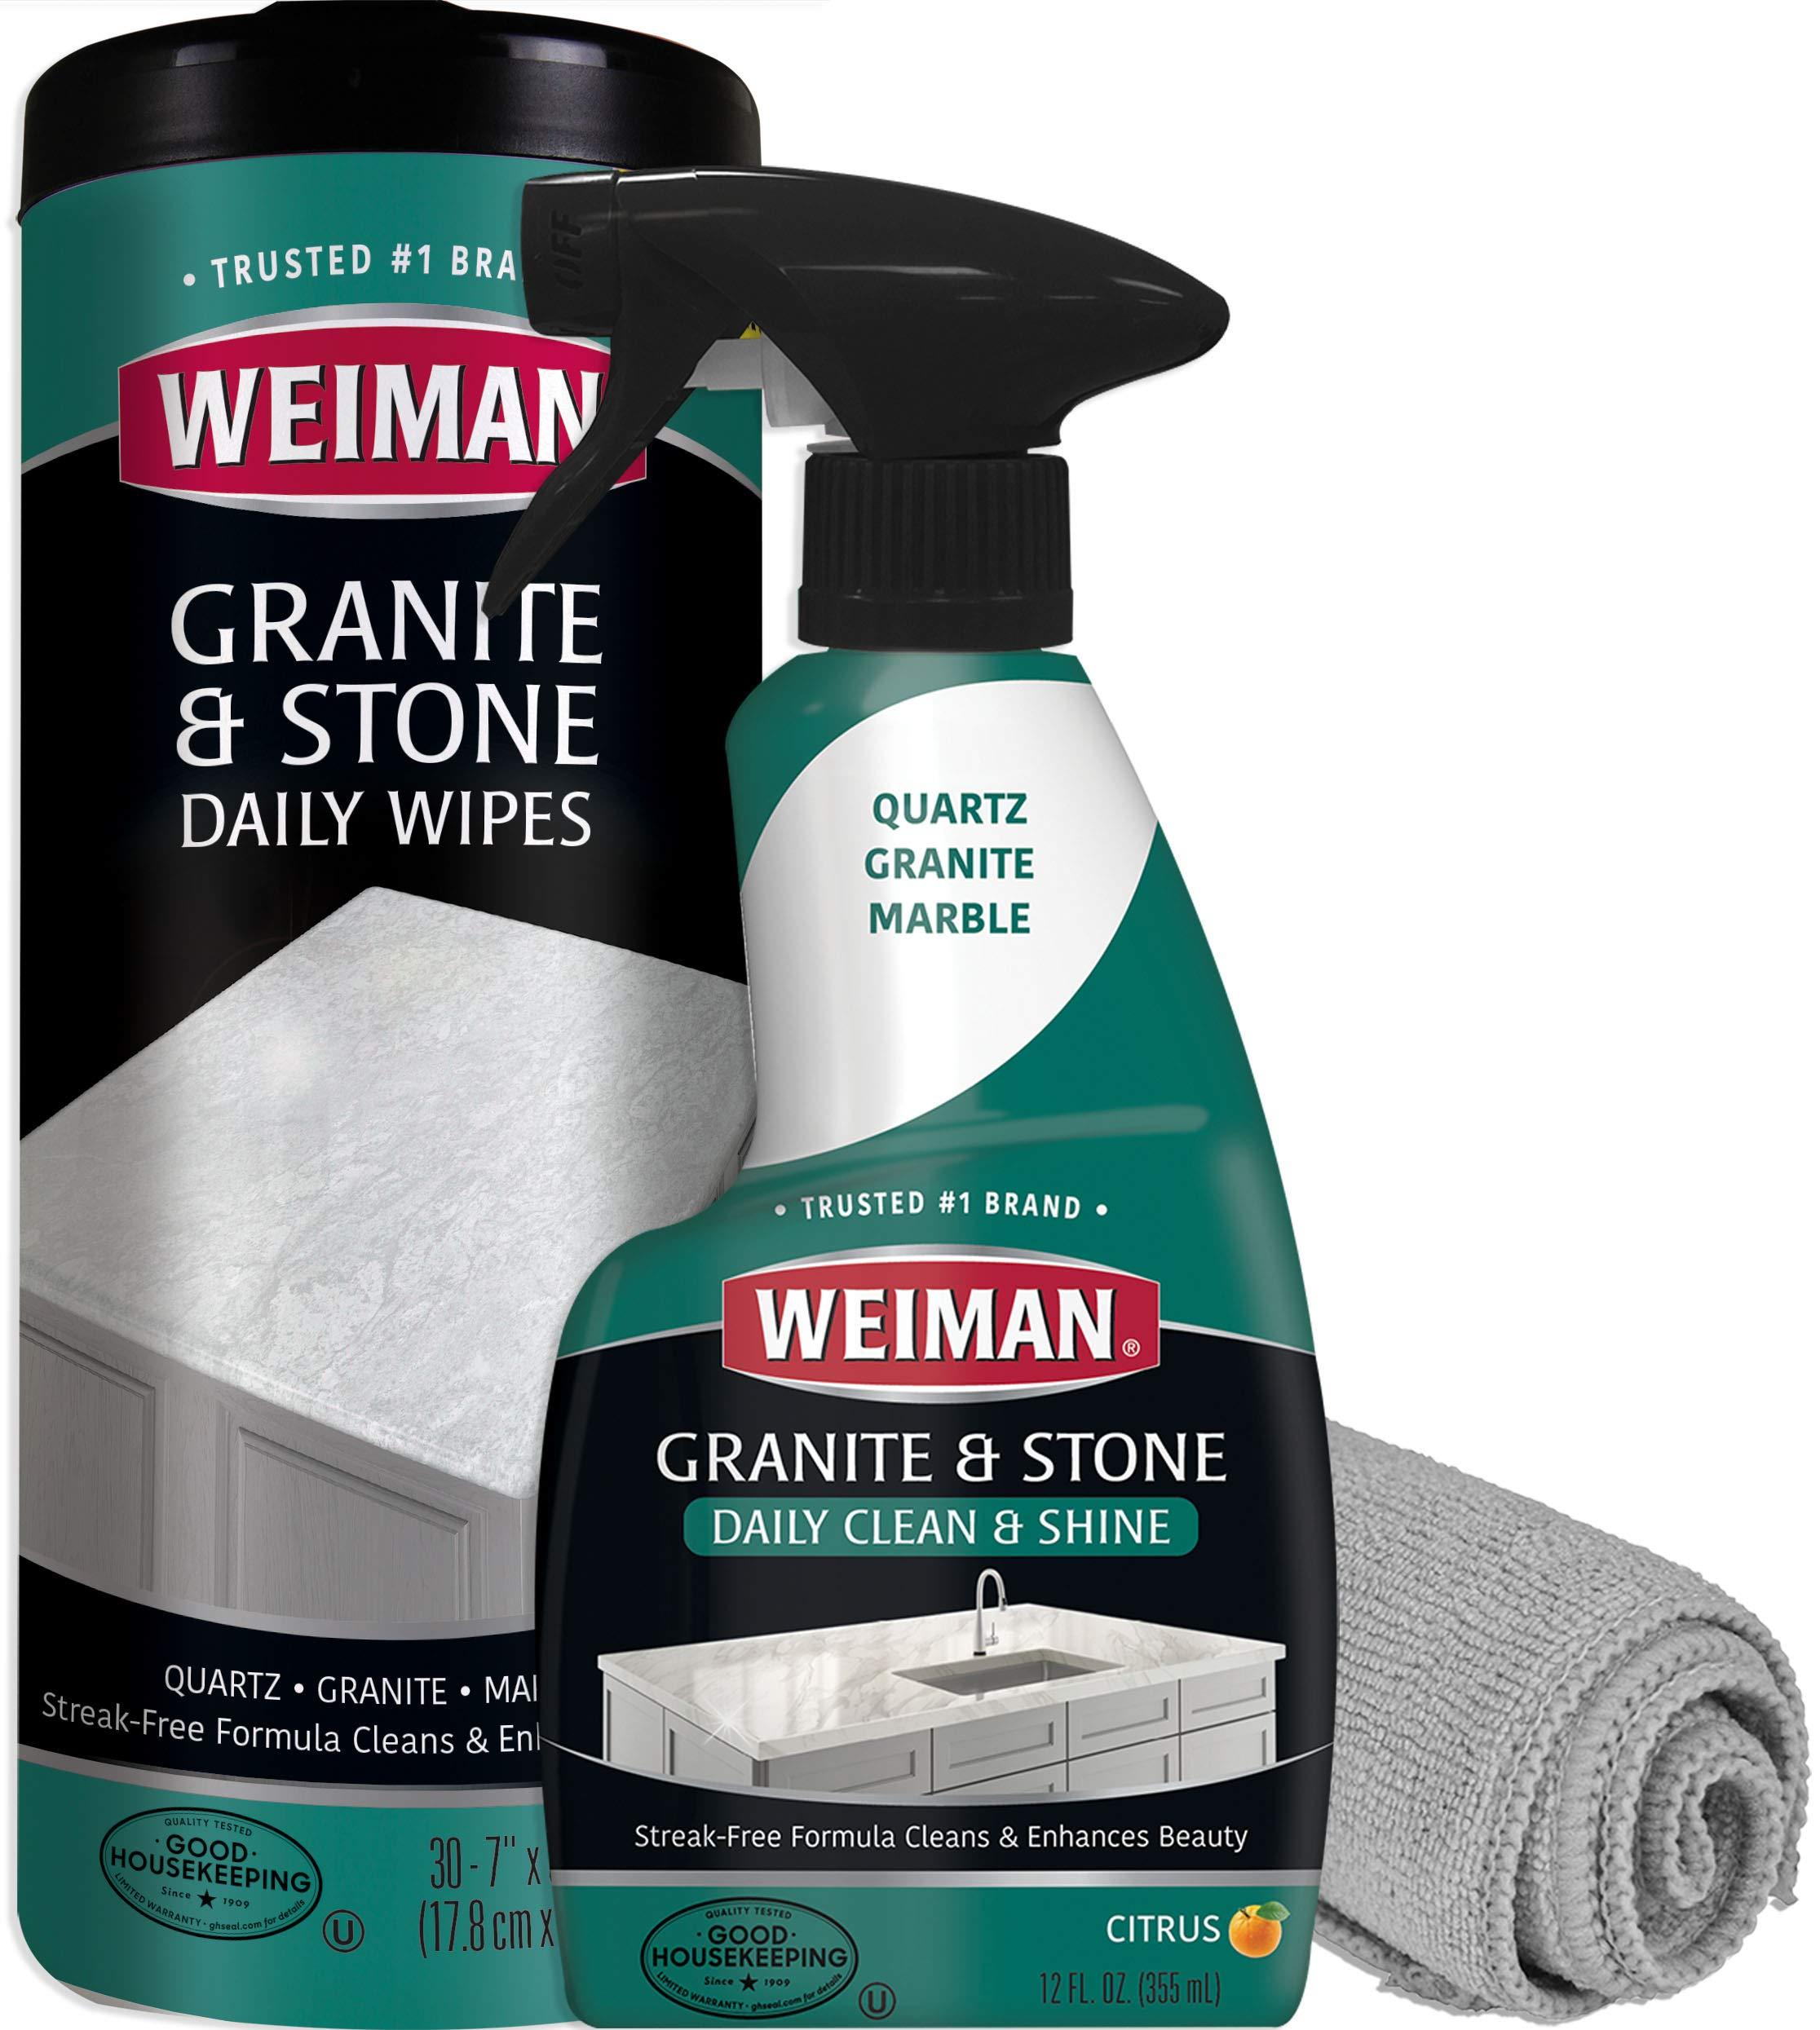 Weiman Granite Cleaner Kit - Non-Toxic for Granite Marble Soapstone Quartz Quartzite Slate Limestone Corian Laminate Tile Countertop by Weiman